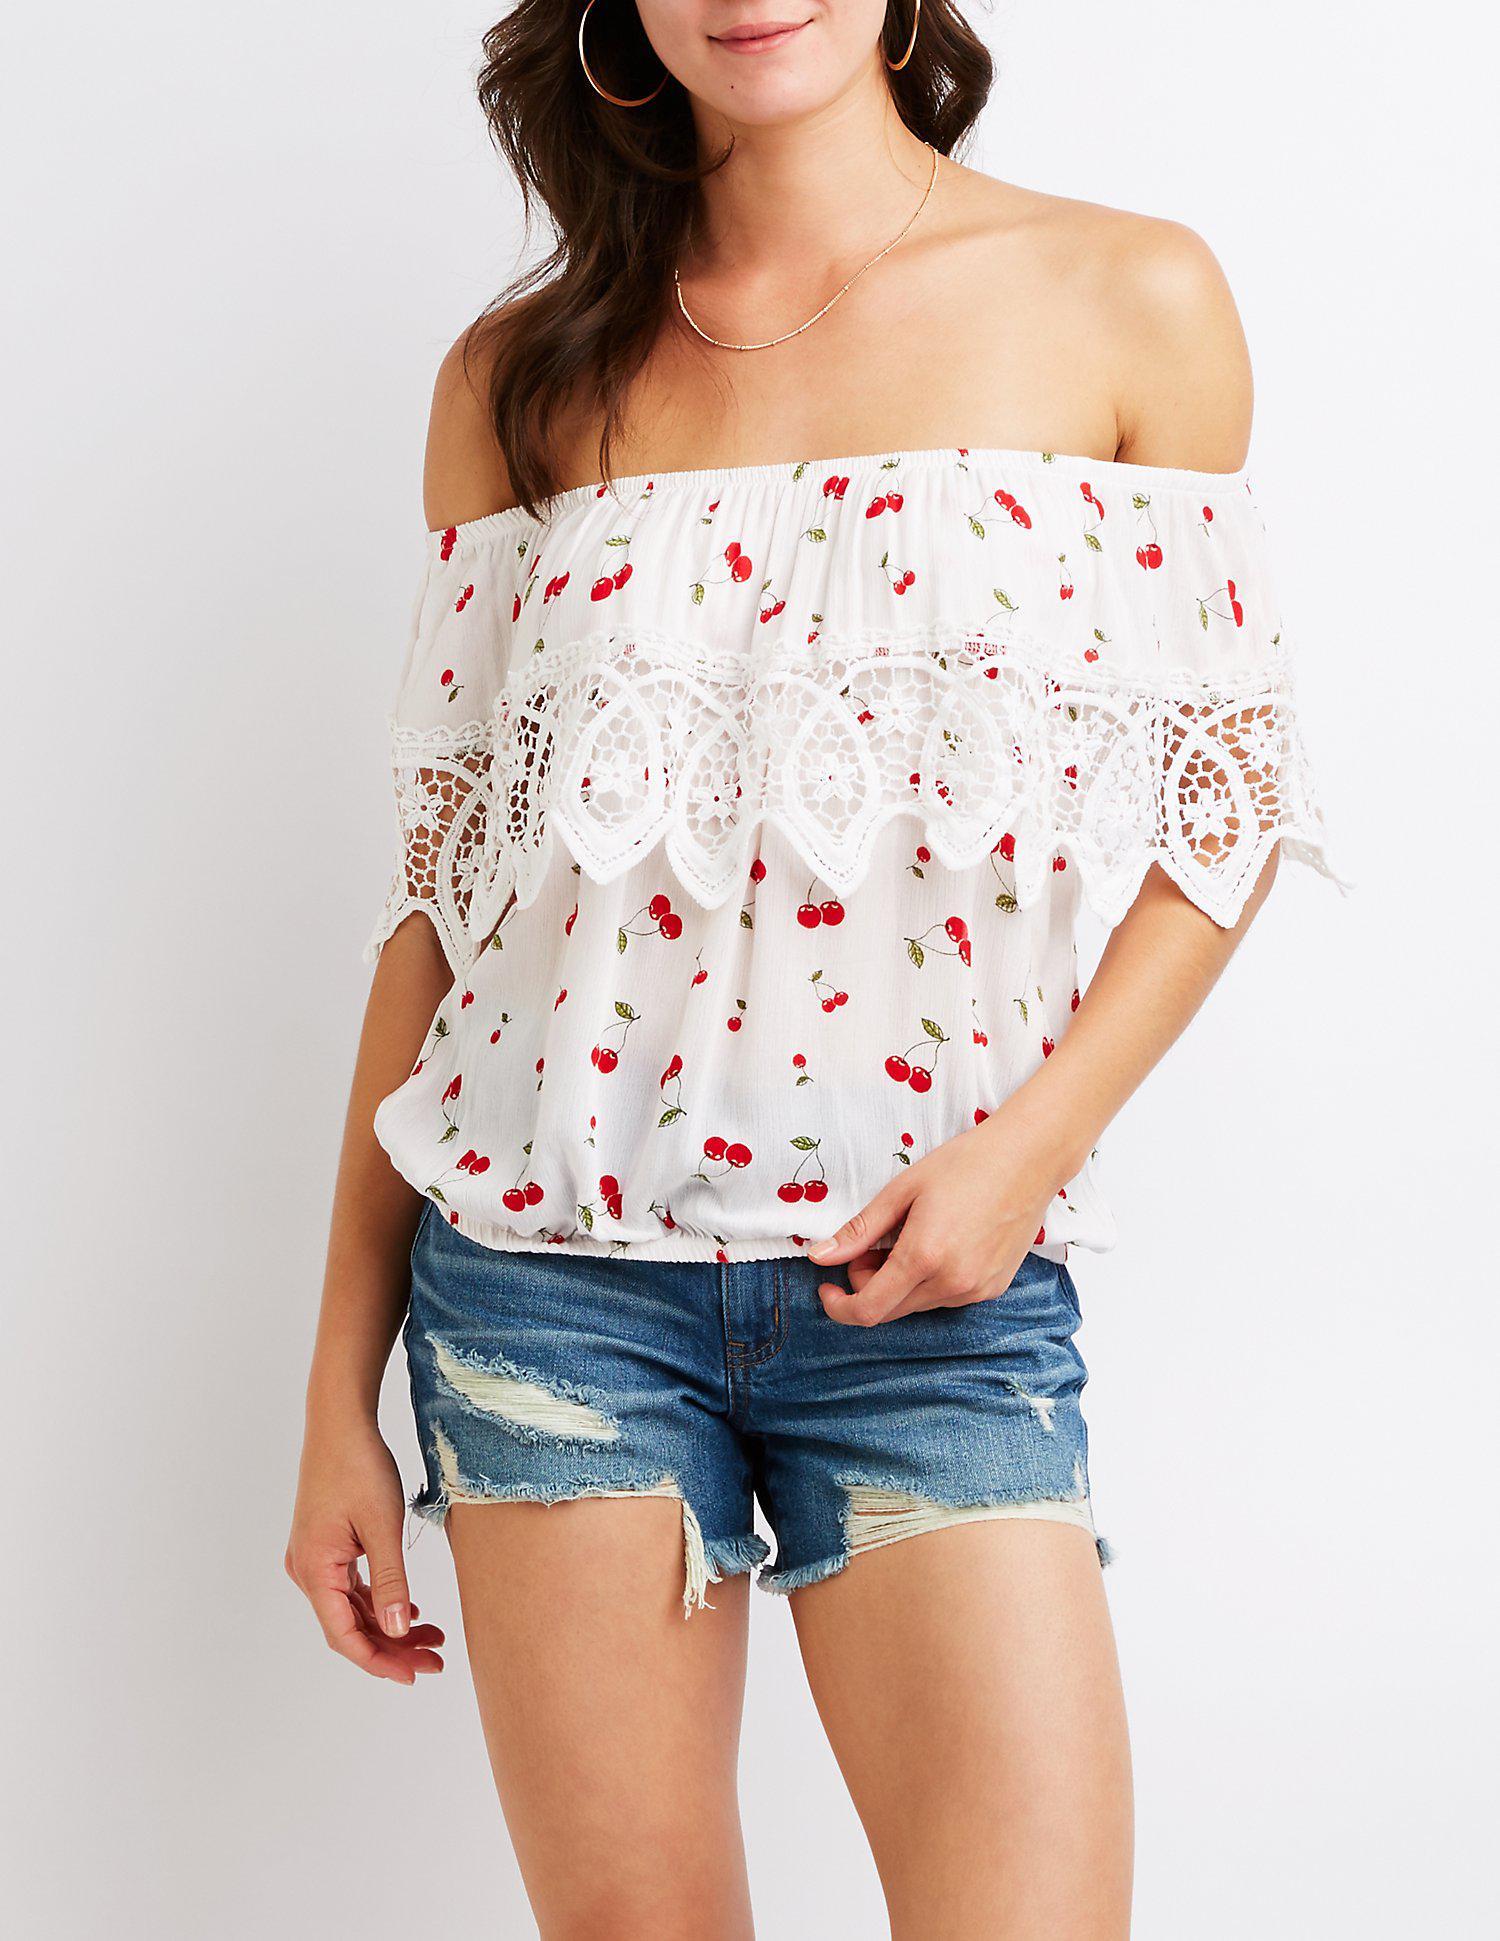 0ee6c859105 Lyst - Charlotte Russe Cherry Print Crochet-trim Off-the-shoulder ...